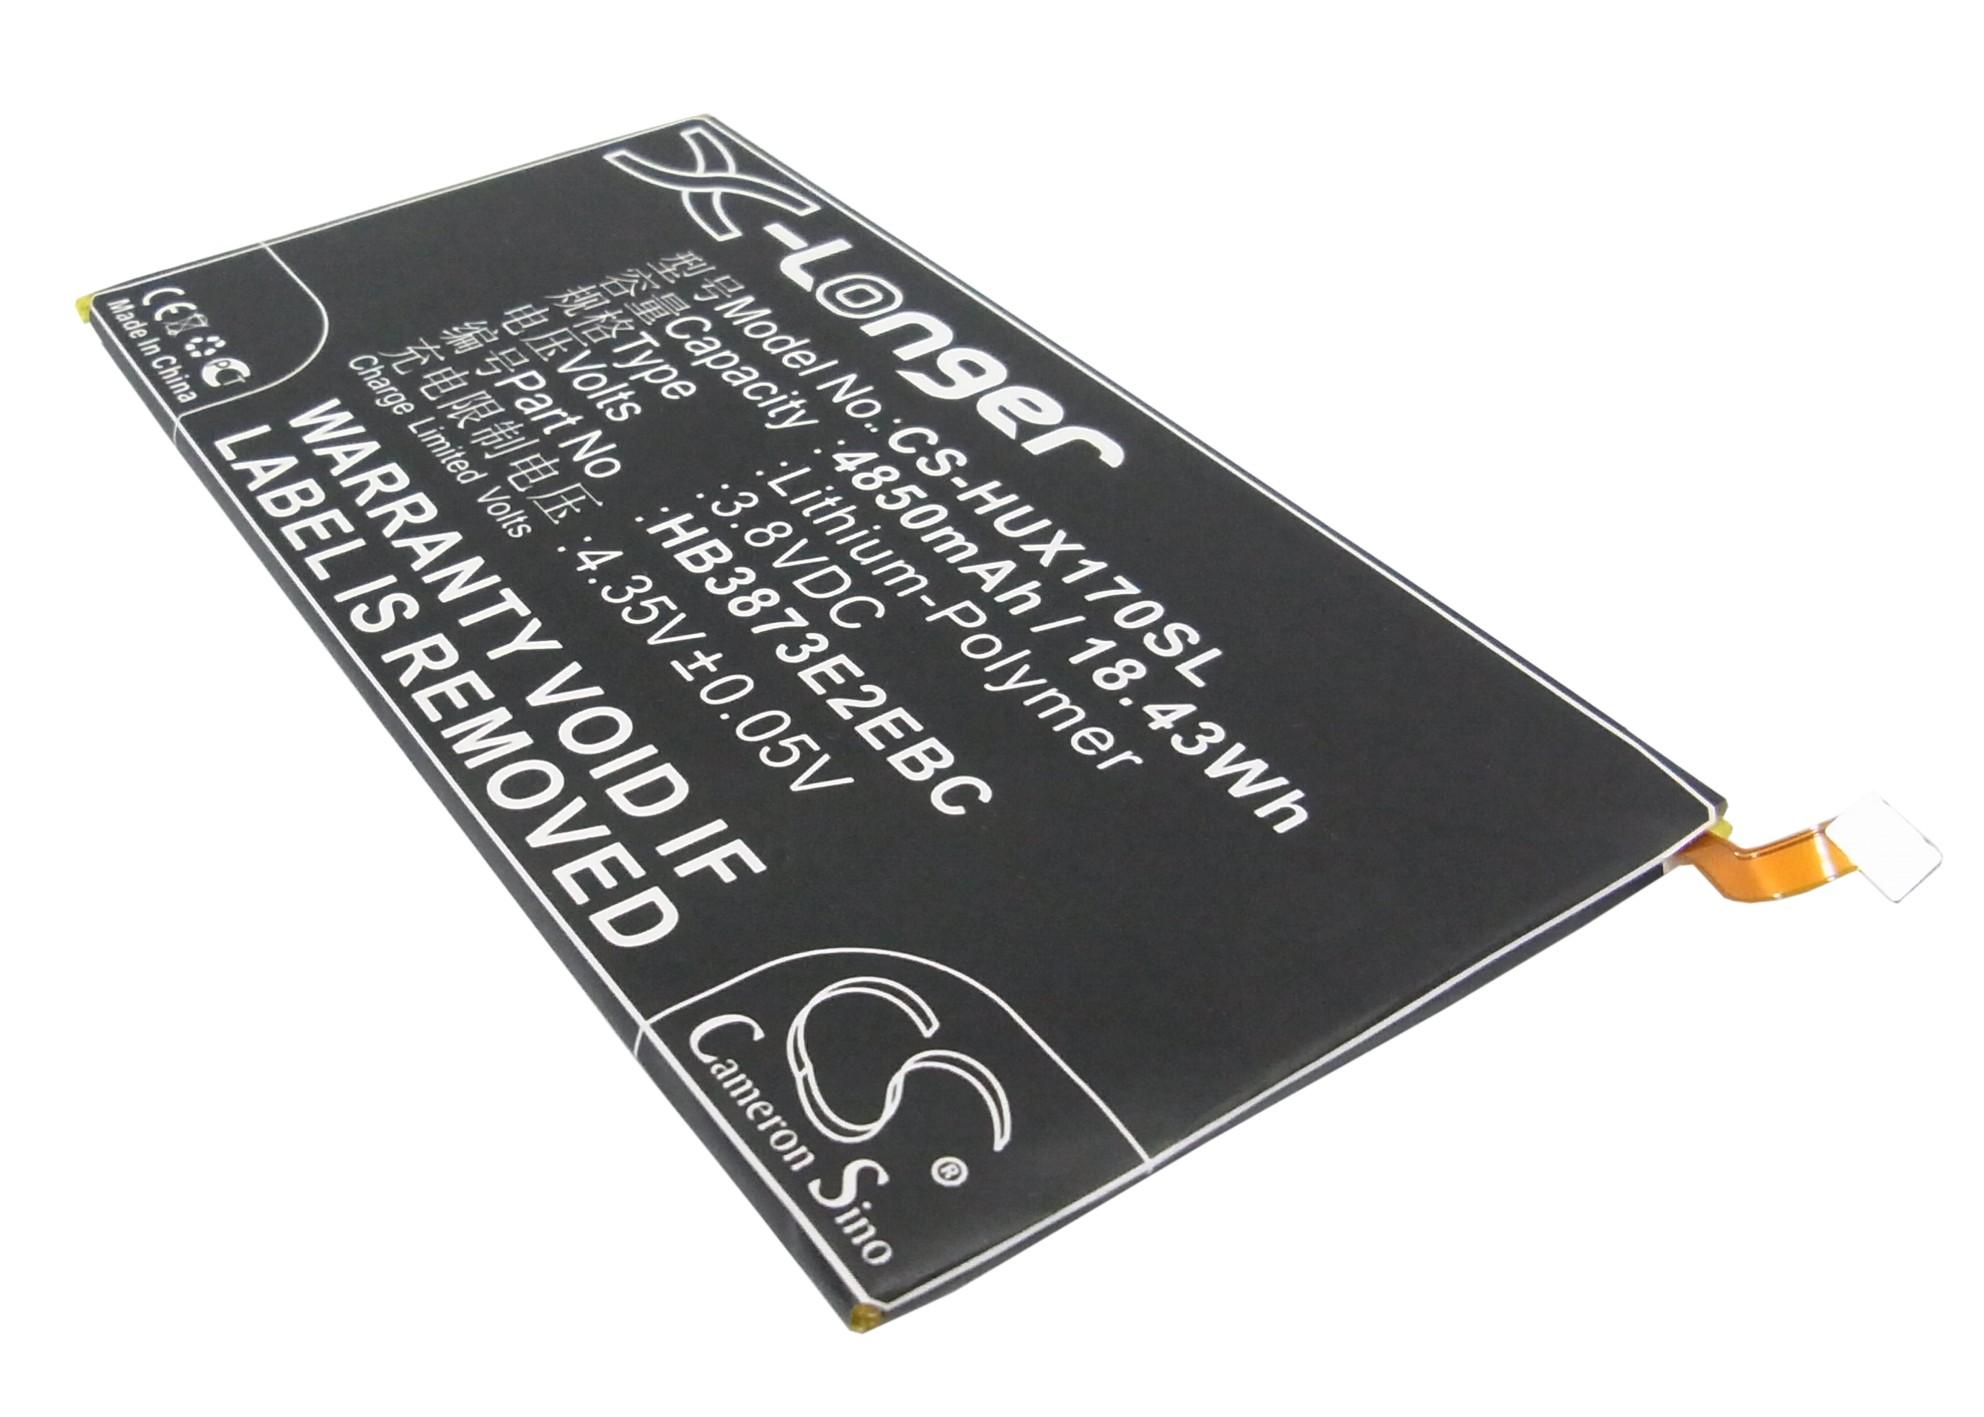 Cameron Sino baterie do tabletů pro HUAWEI Mediapad X1 7.0 3.8V Li-Polymer 4850mAh černá - neoriginální